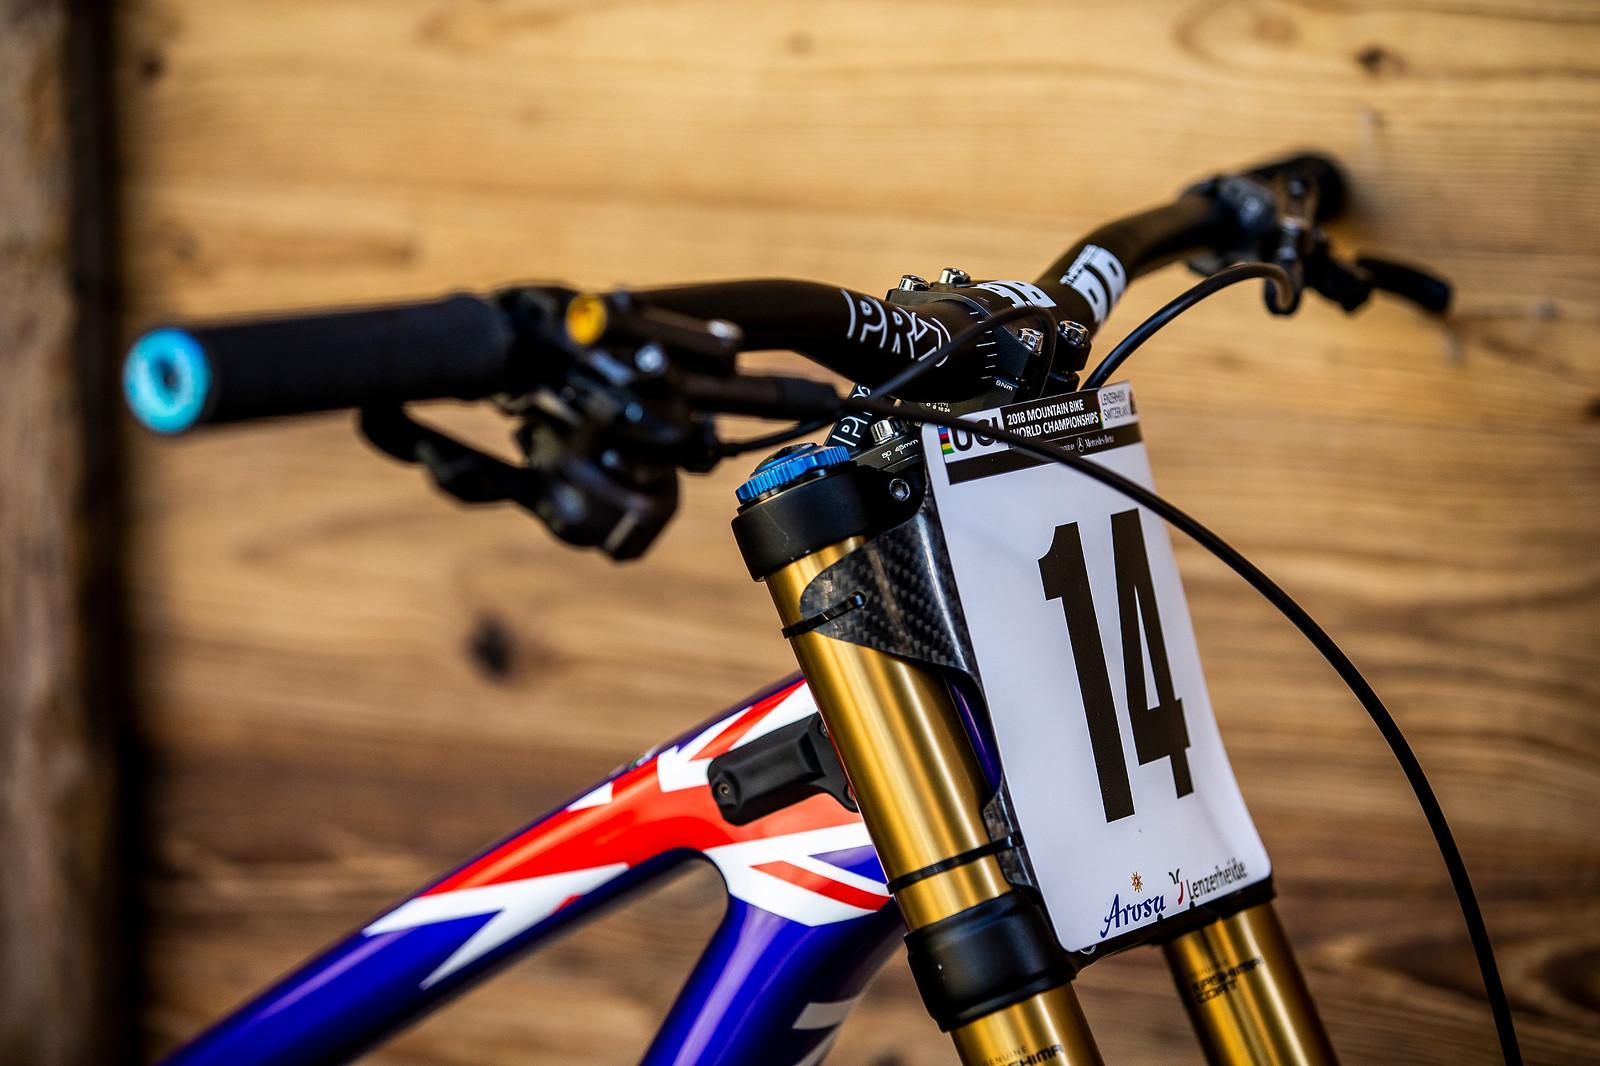 Pro Cockpit - WORLD CHAMPS BIKE - Matt Walker's Saracen Myst - Mountain Biking Pictures - Vital MTB